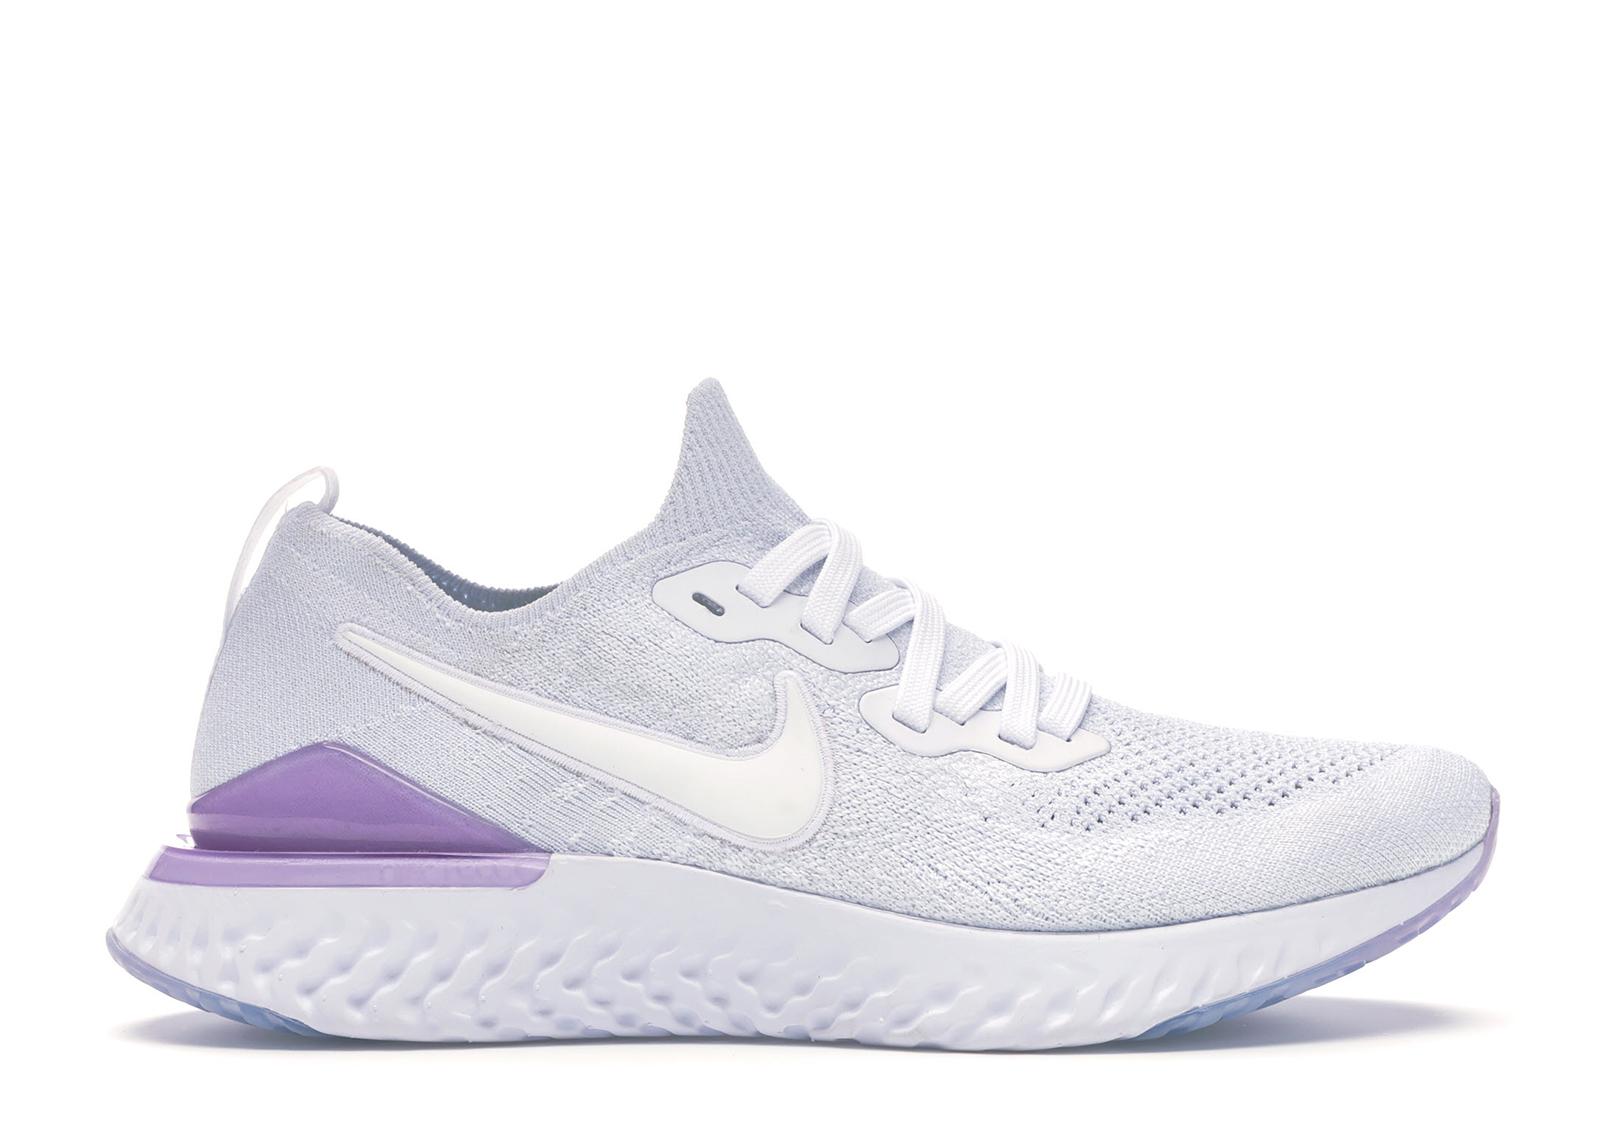 Nike Epic React Flyknit 2 White Pink